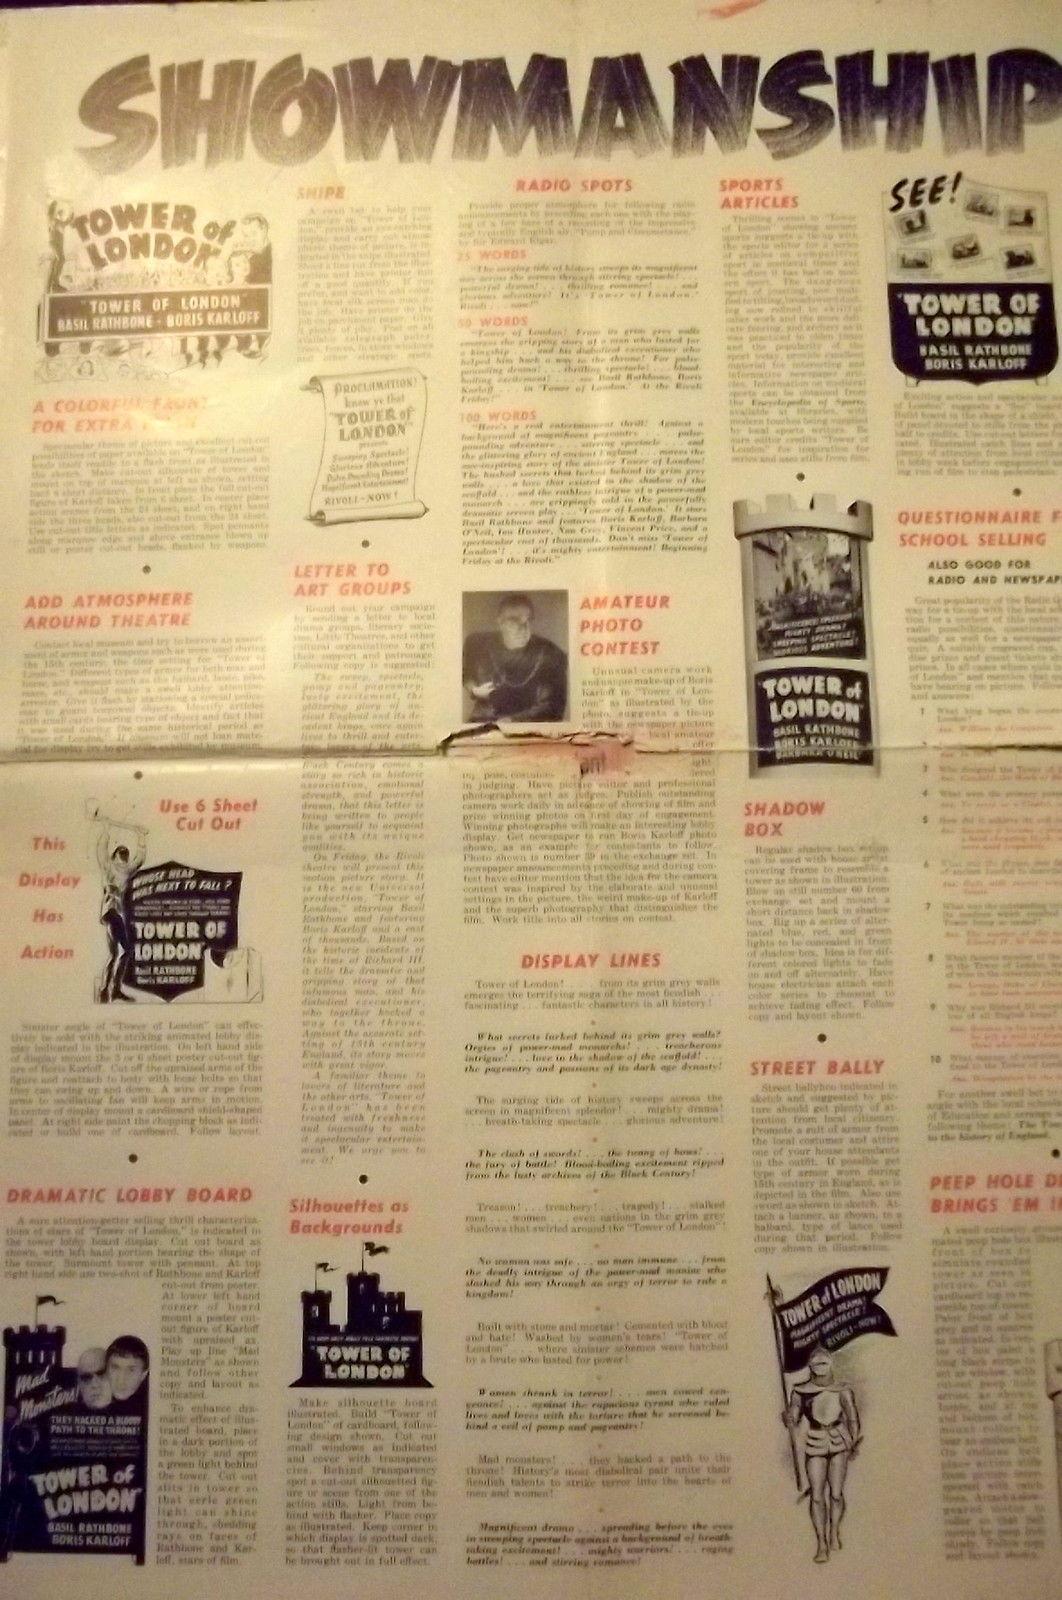 BORIS KARLOFF,BASIL RATHBONE,V.PRICE (TOWER OF LONDON) ORIG,1939 PRESSBOOK